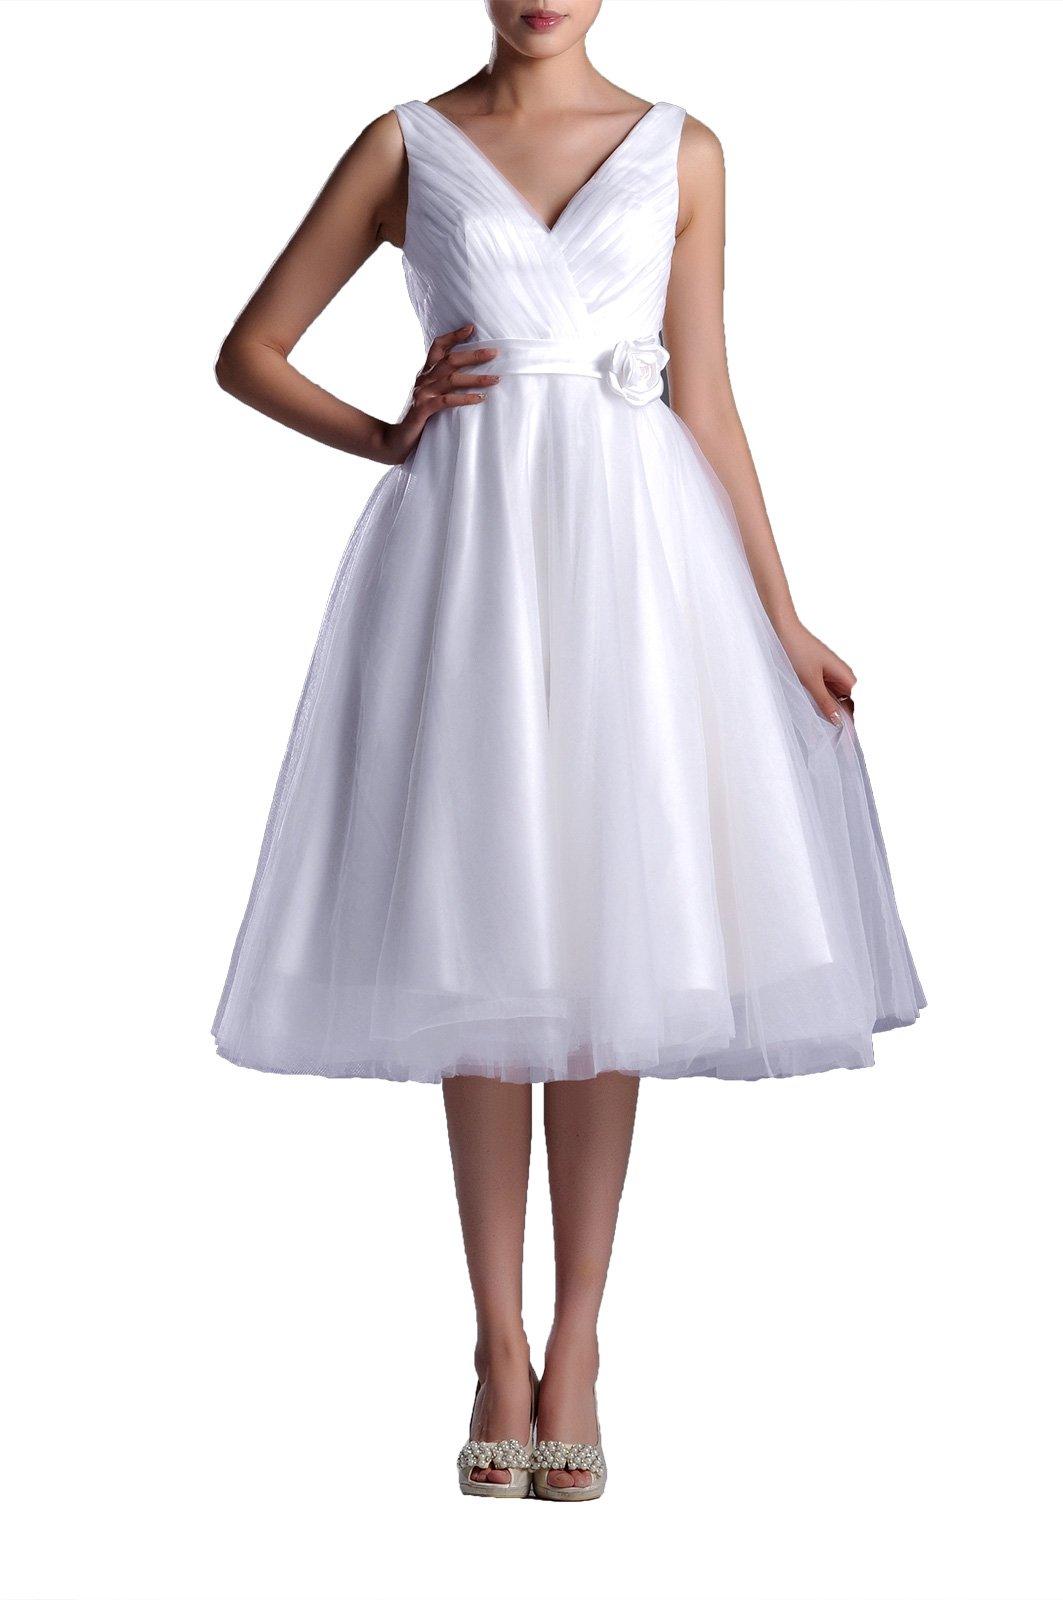 Wedding Dresses V-Neck Bridal Gowns Simple A-Line Tea Length Wedding Dress Bride Short, Color White,2